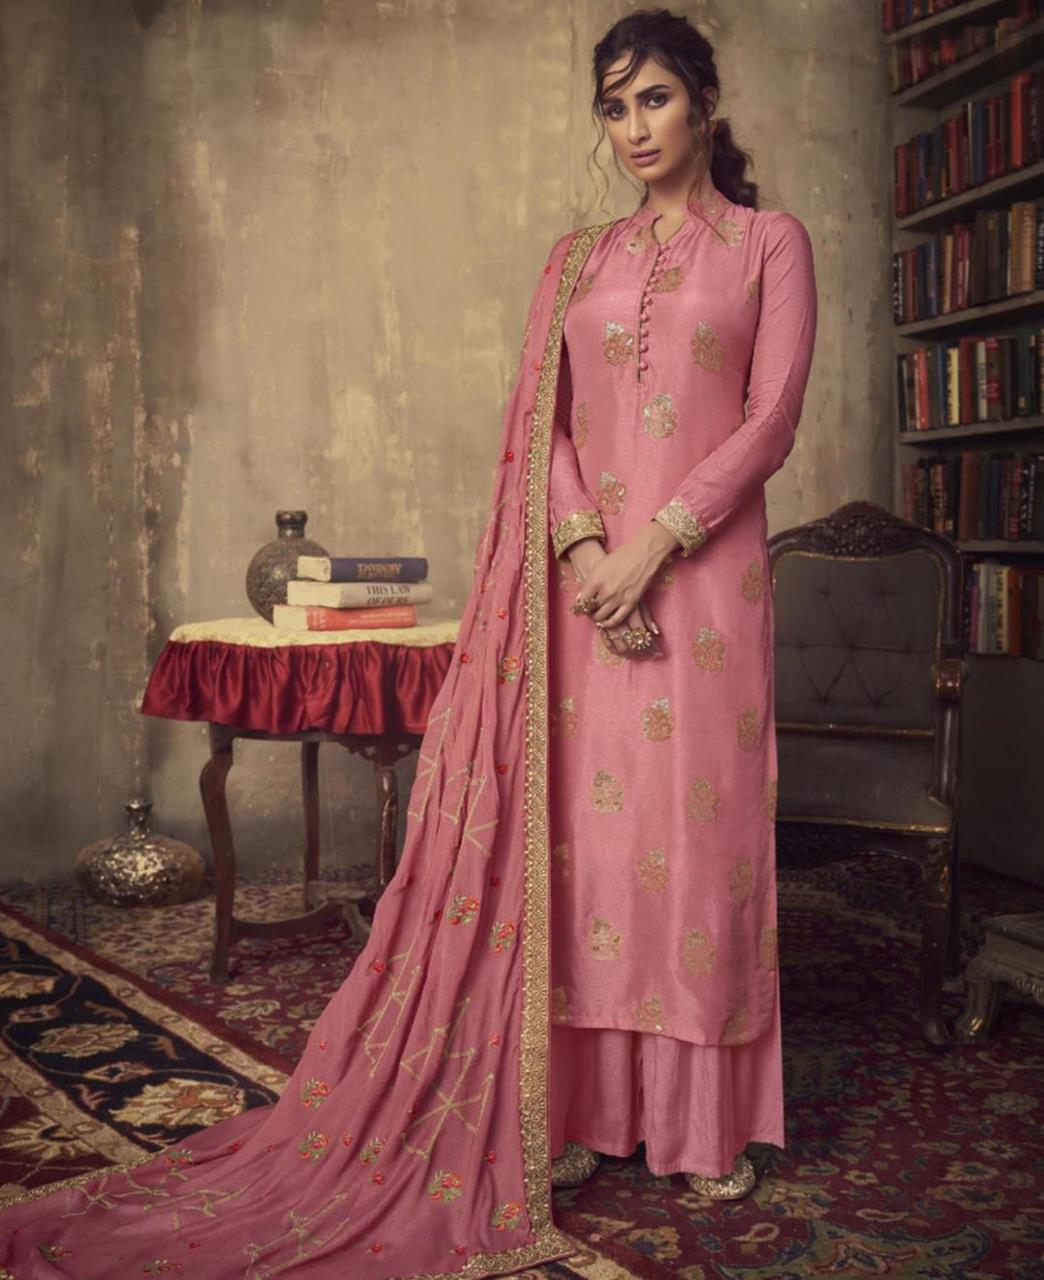 Stone Work Jacquard Straight cut Salwar Kameez in Light Pink